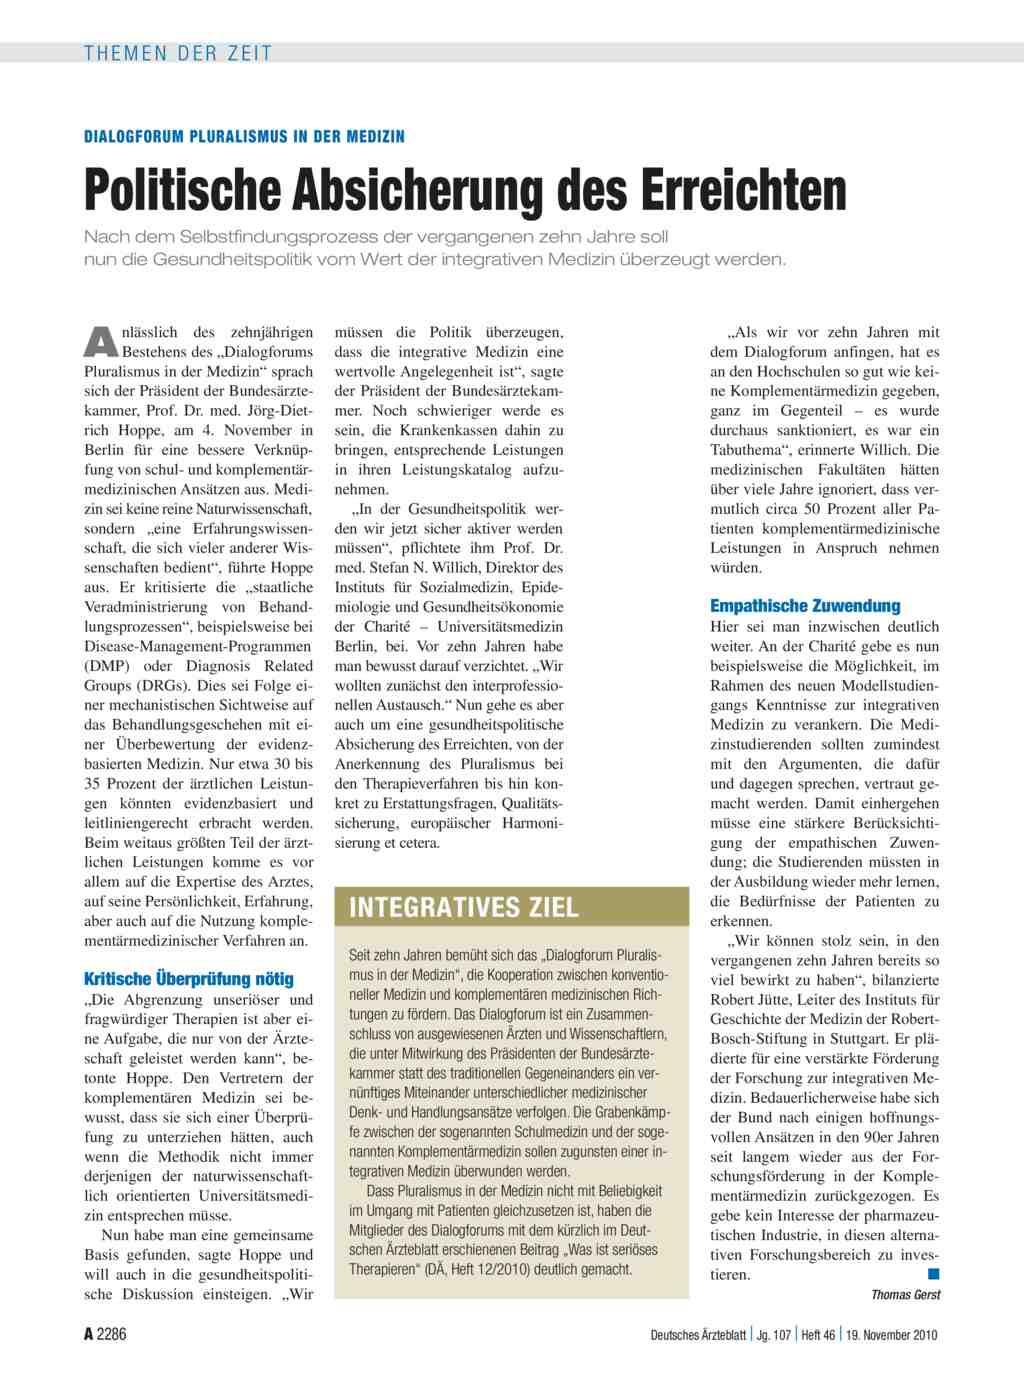 Dialogforum pluralismus in der medizin politische for Medizin studieren schweiz